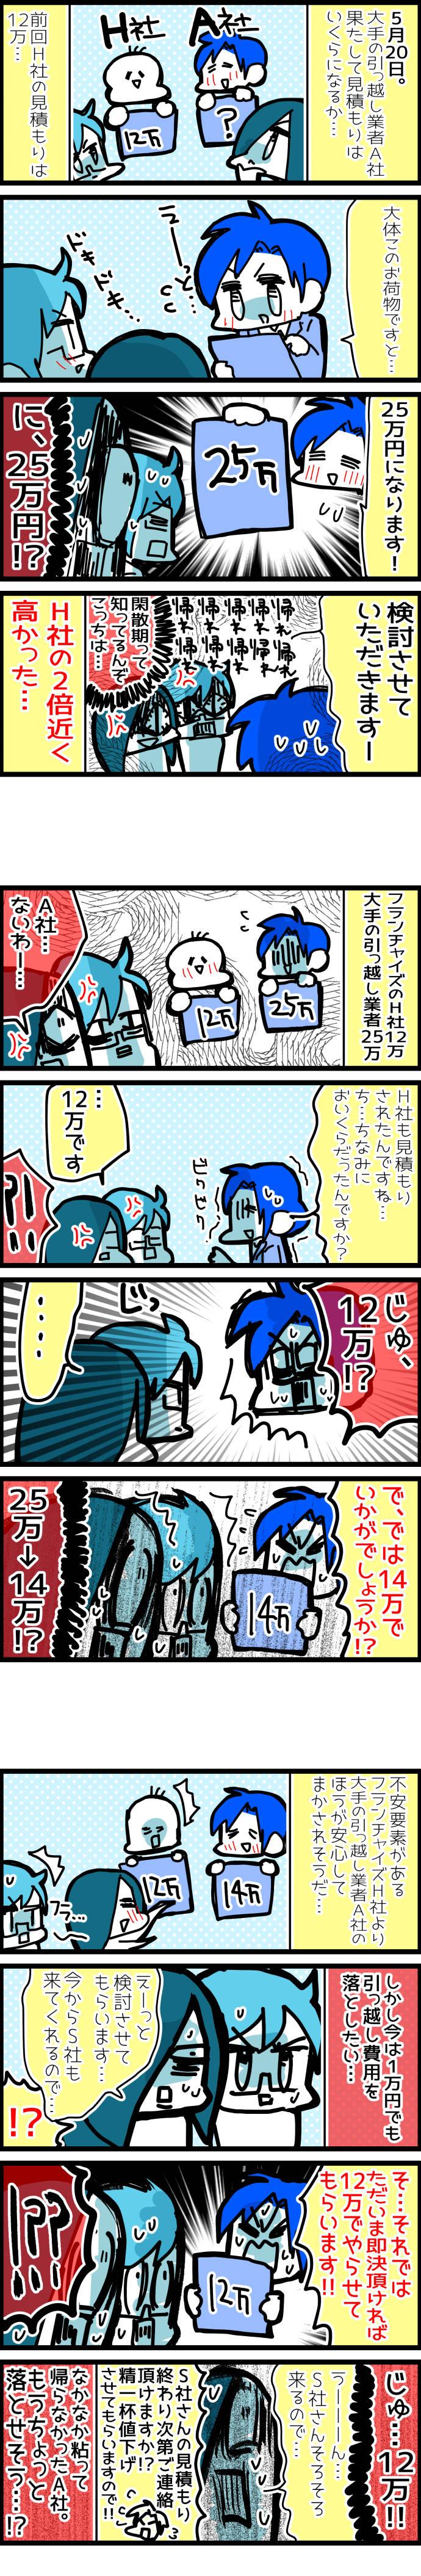 neetsadami.com_15話サムネ